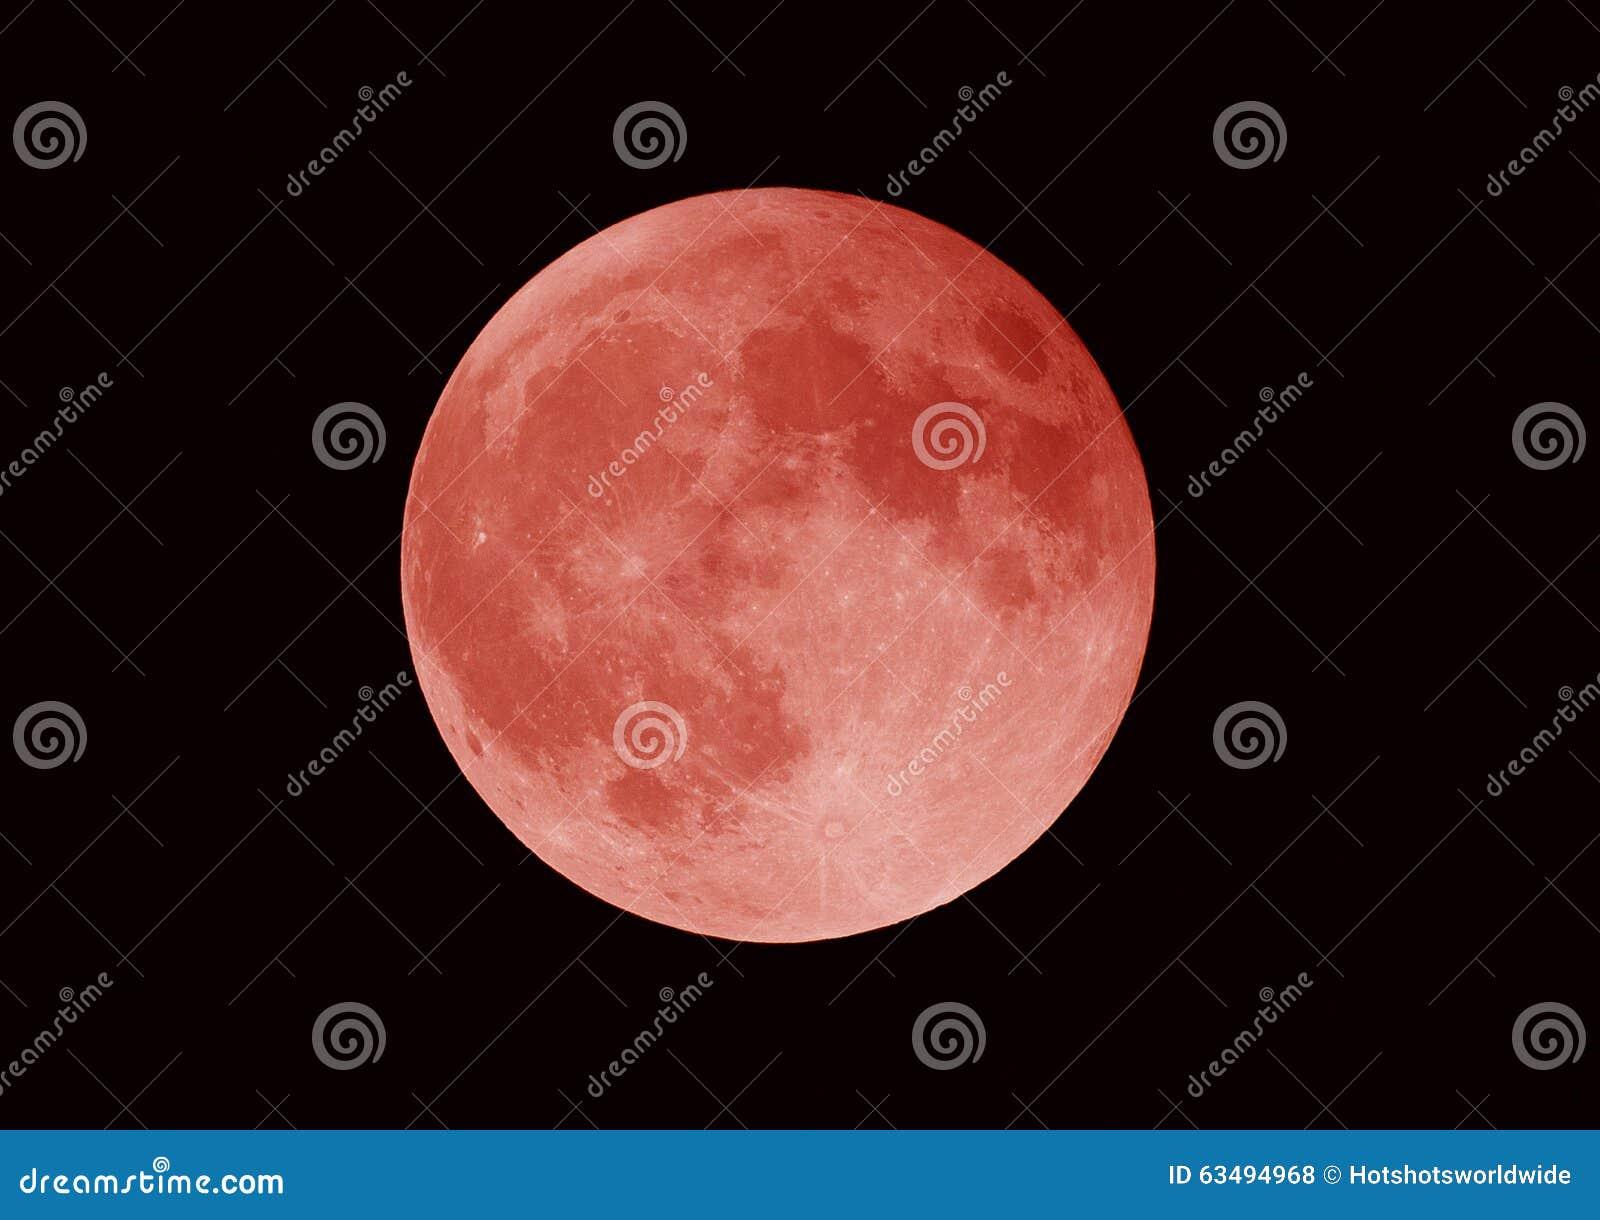 Luna eccellente del sangue, eclissi lunare, Los Angeles, California